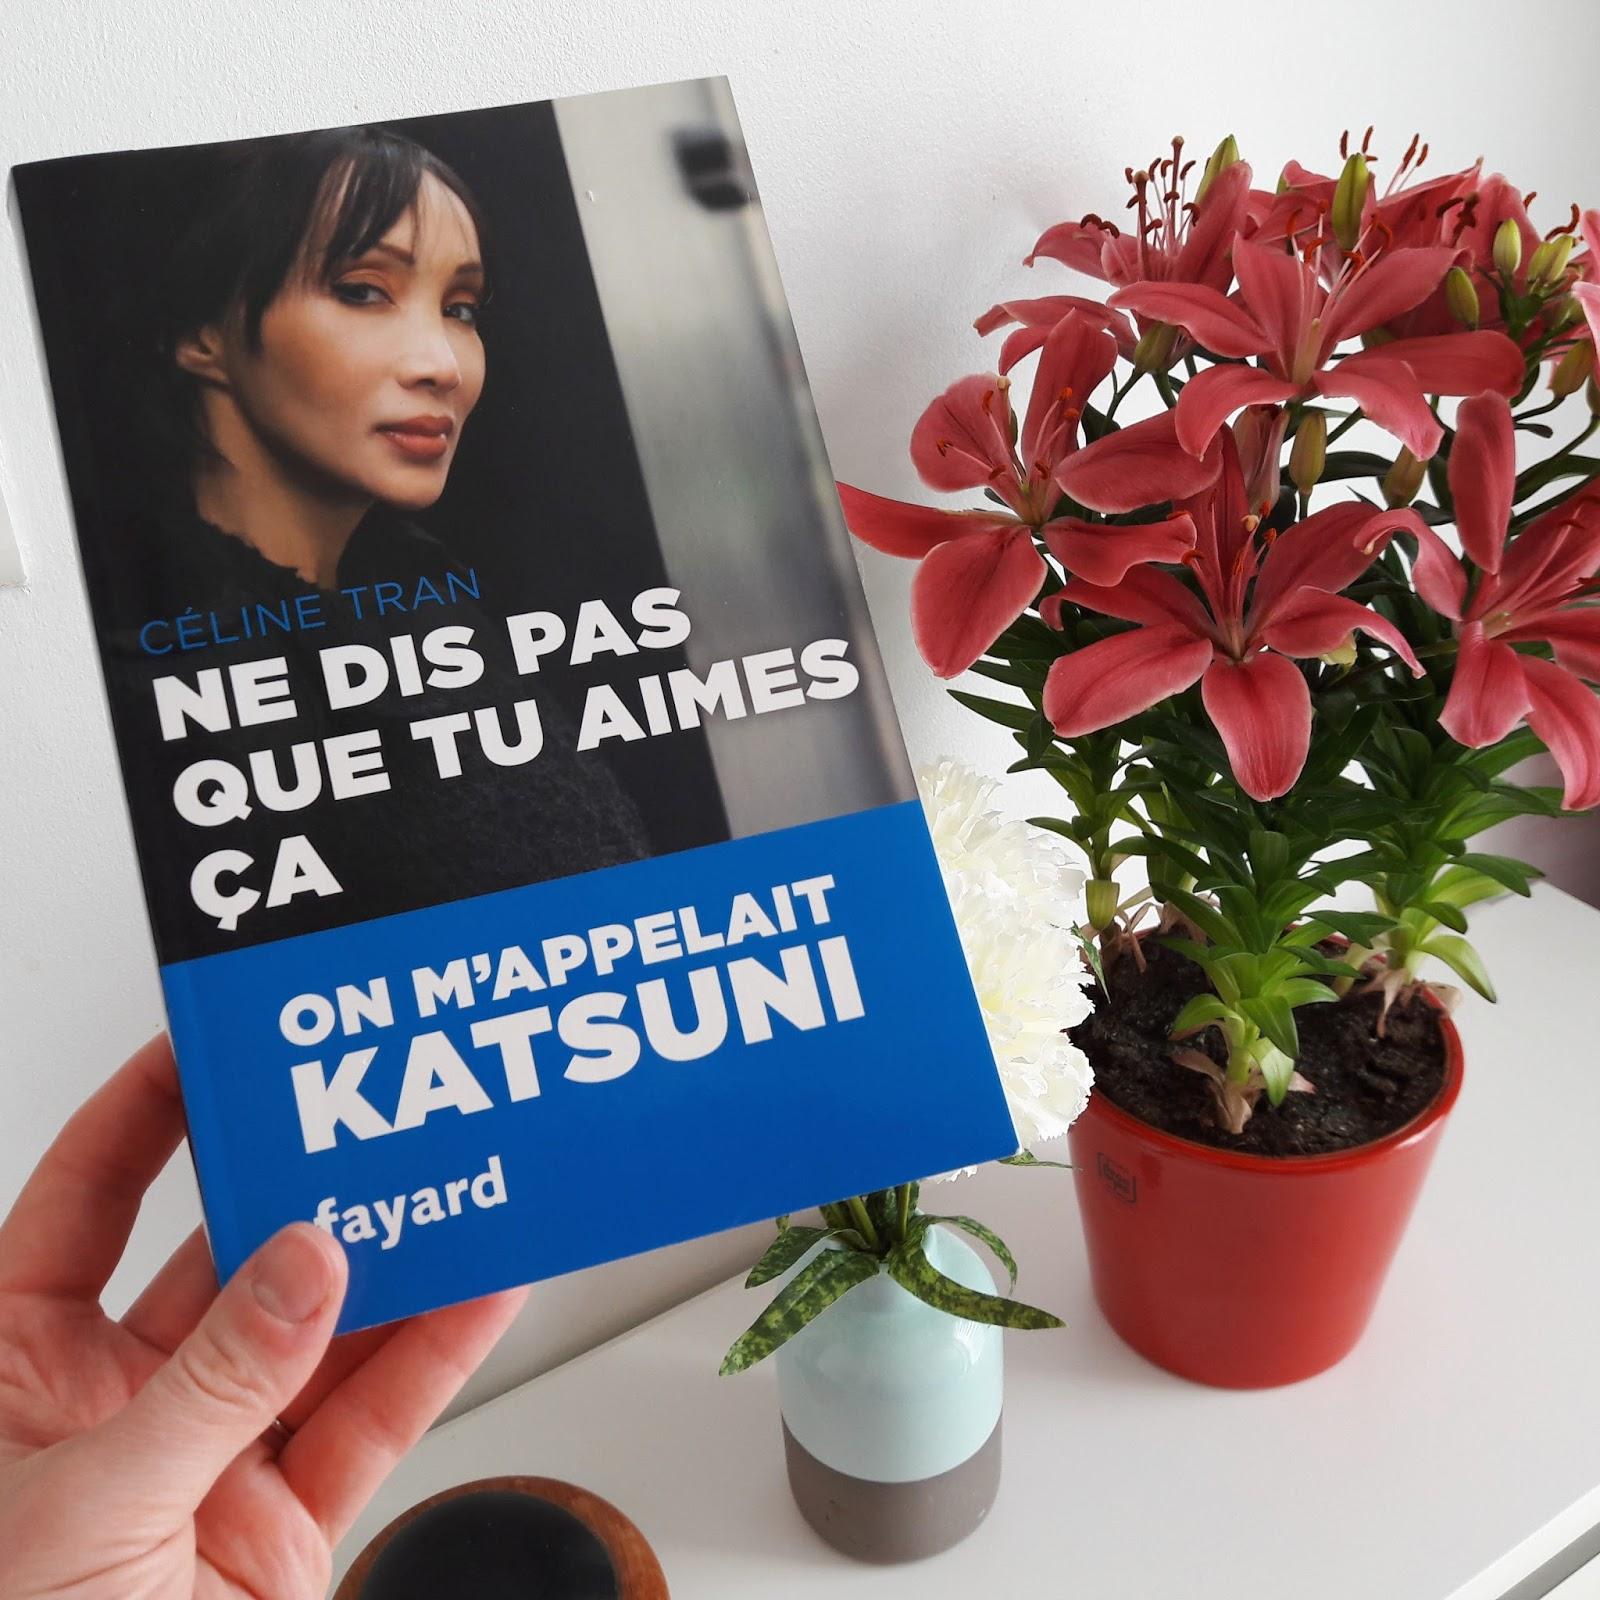 Ne dis pas que tu aimes ça de Céline Tran